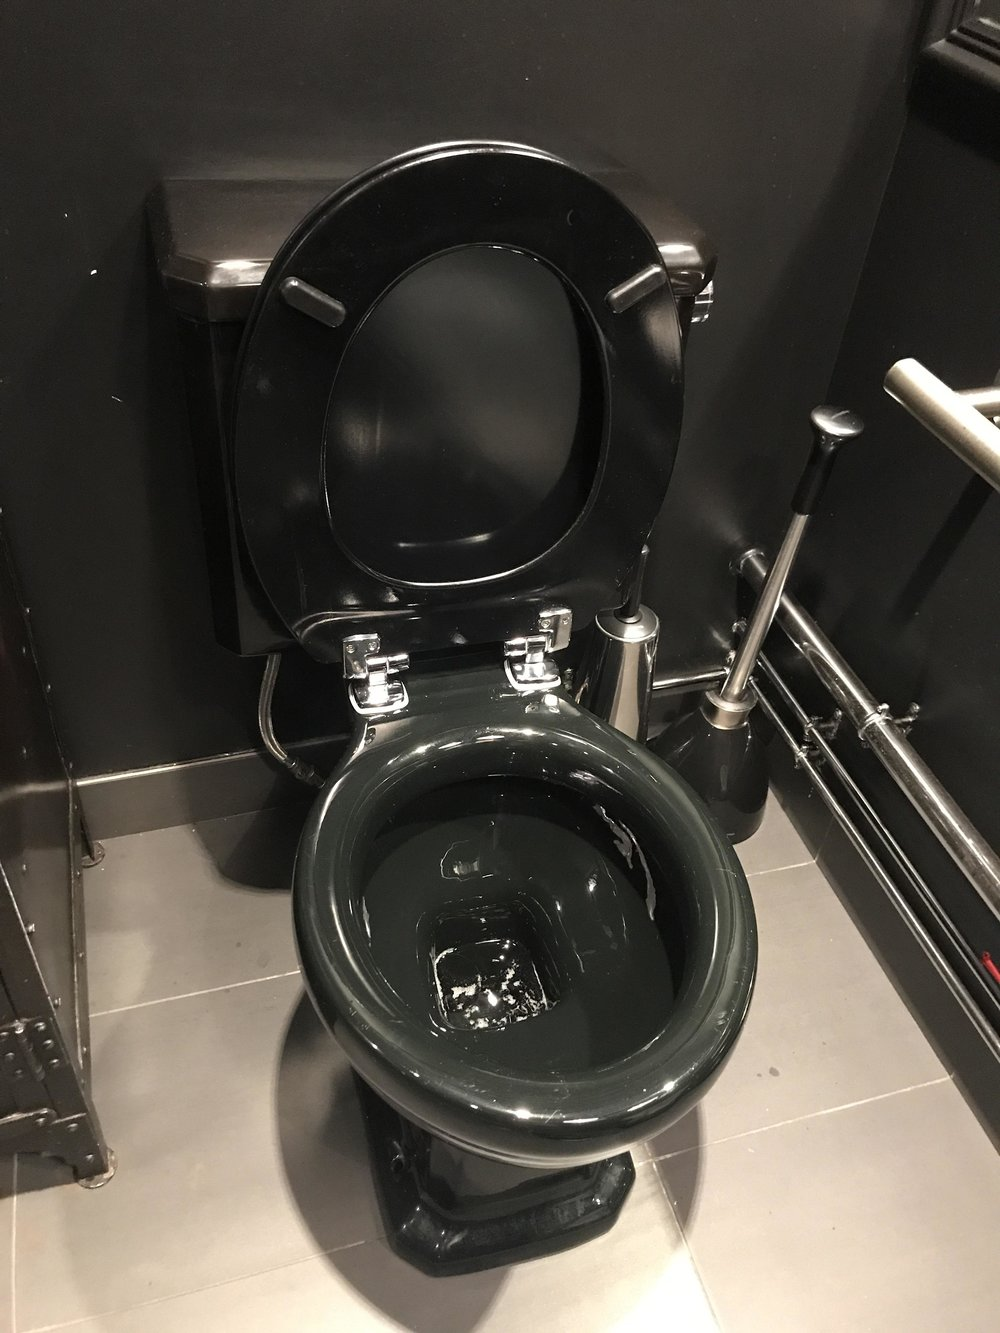 Black Toilet.jpg